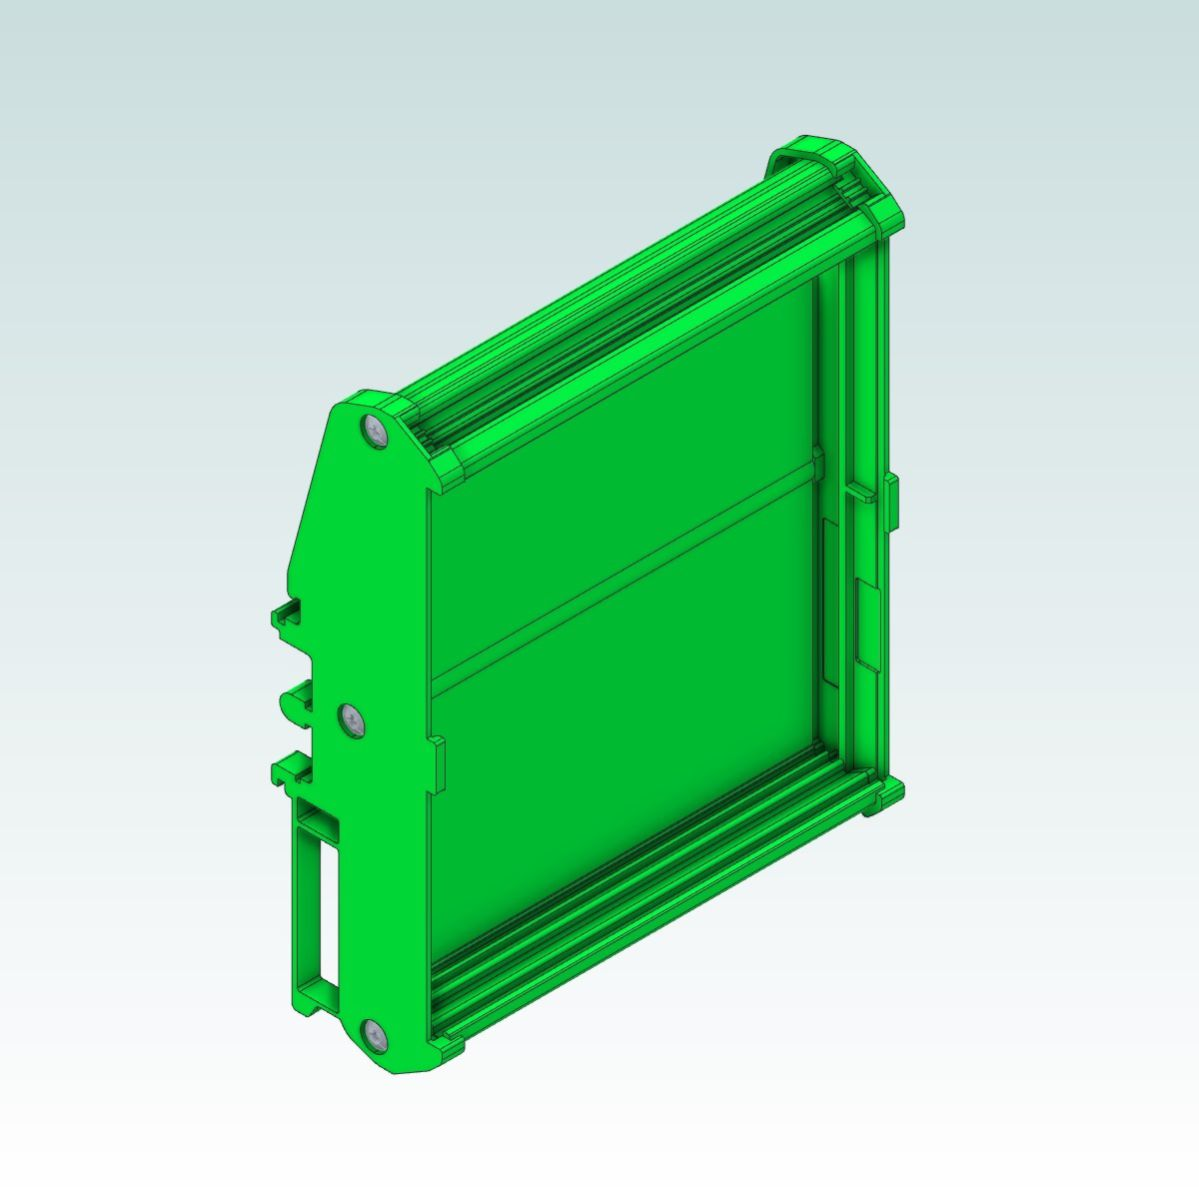 51511 cnc720 dinrail mount render